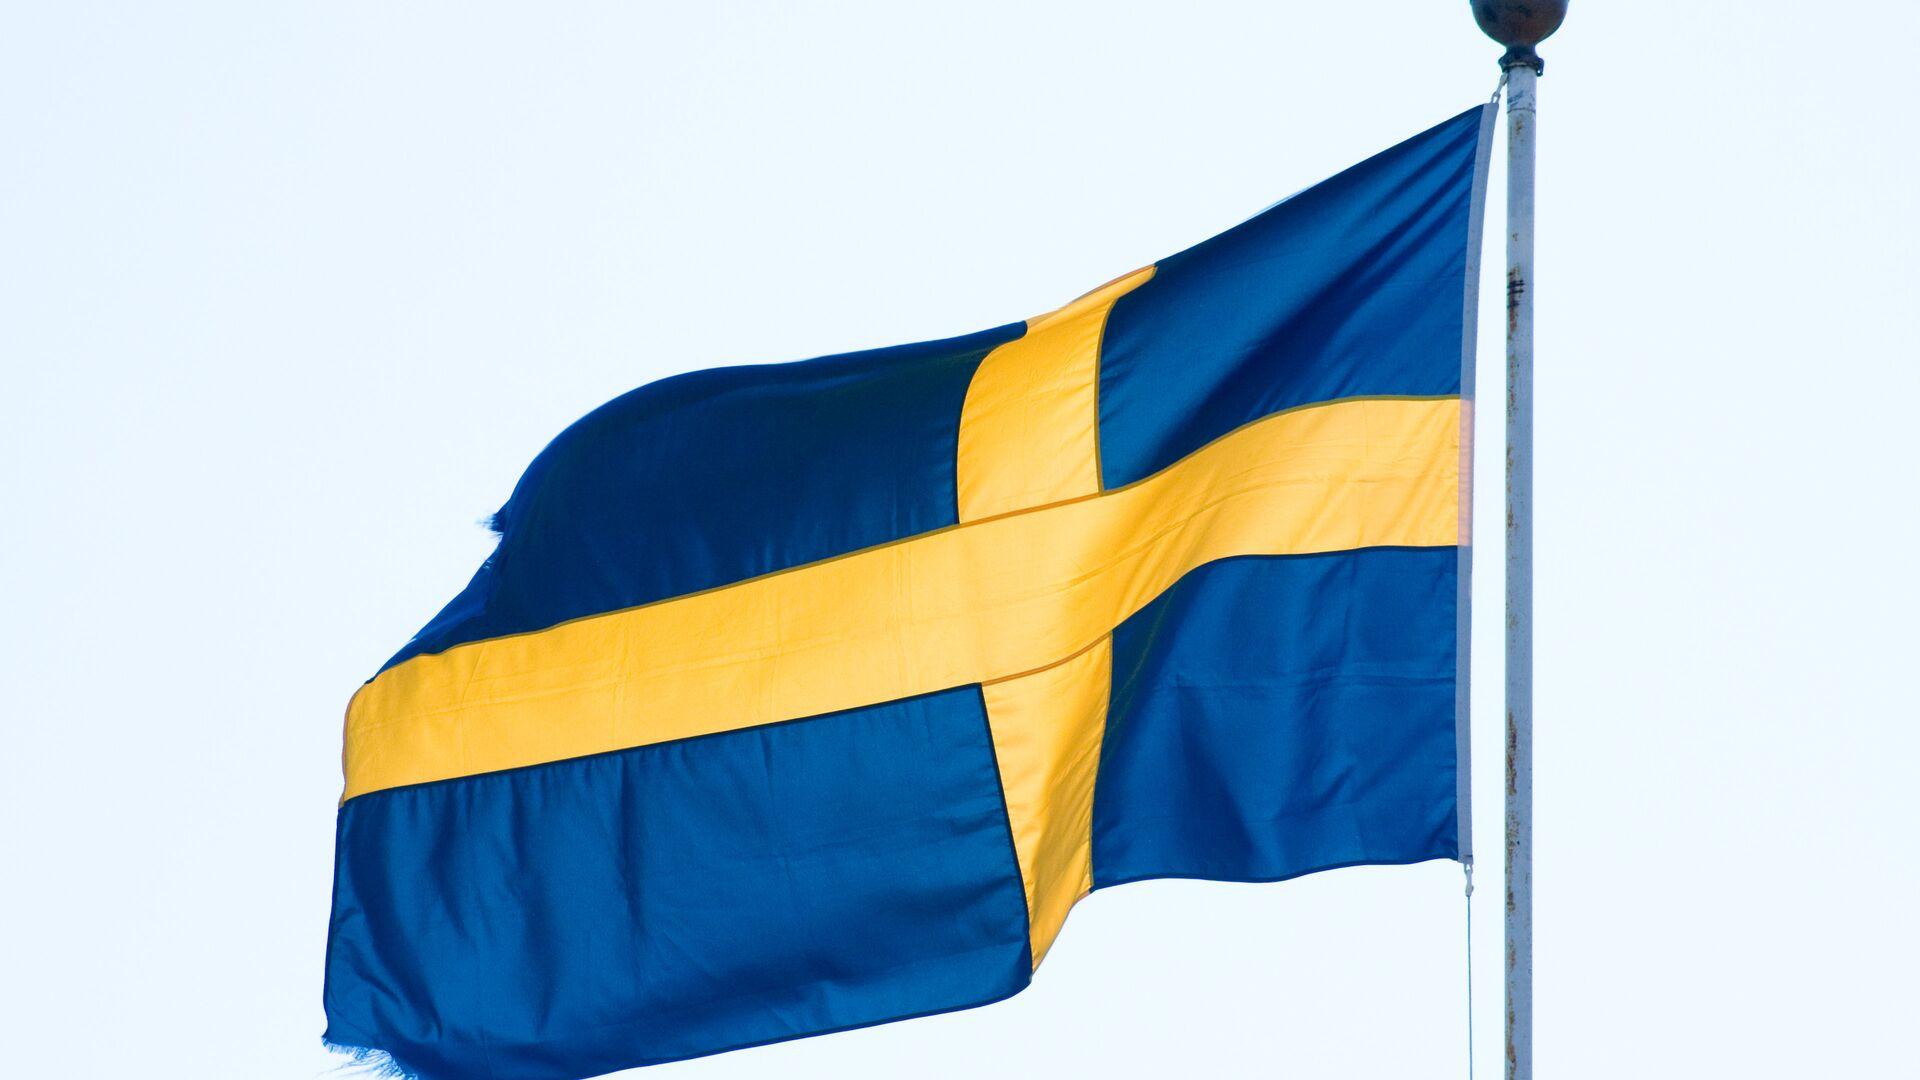 Bandera de Suecia - Sputnik Mundo, 1920, 26.05.2021